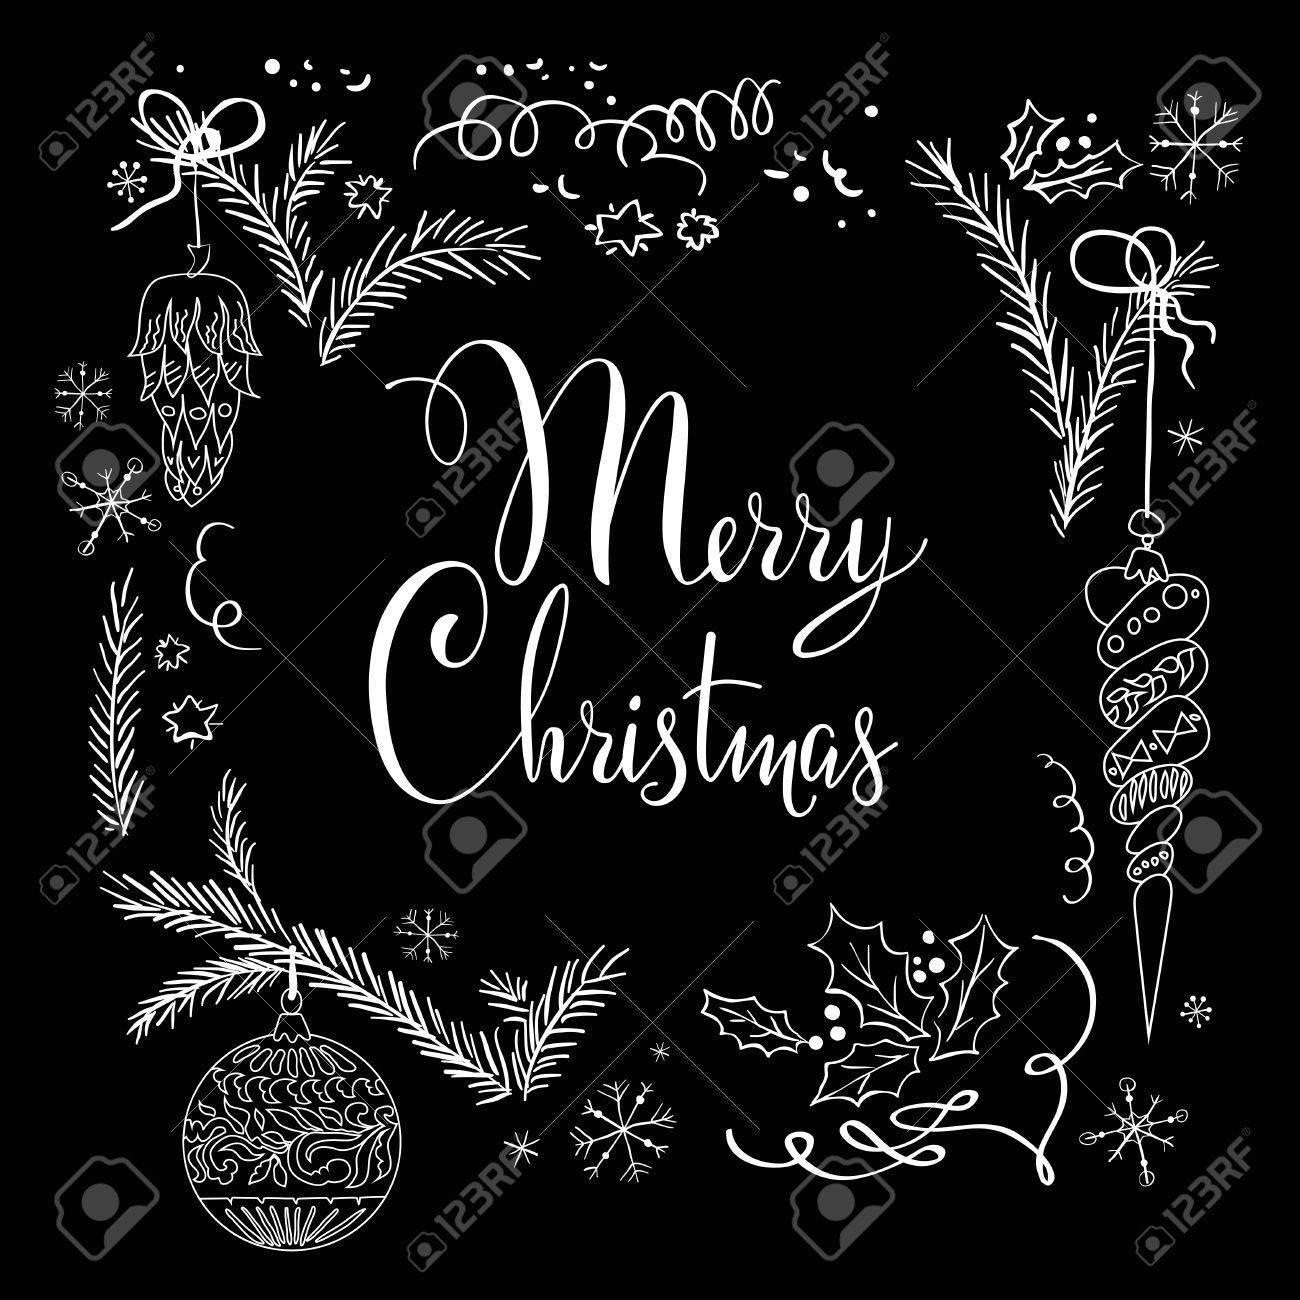 Christmas Board Design.Merry Christmas On Black Board Holiday Sketch